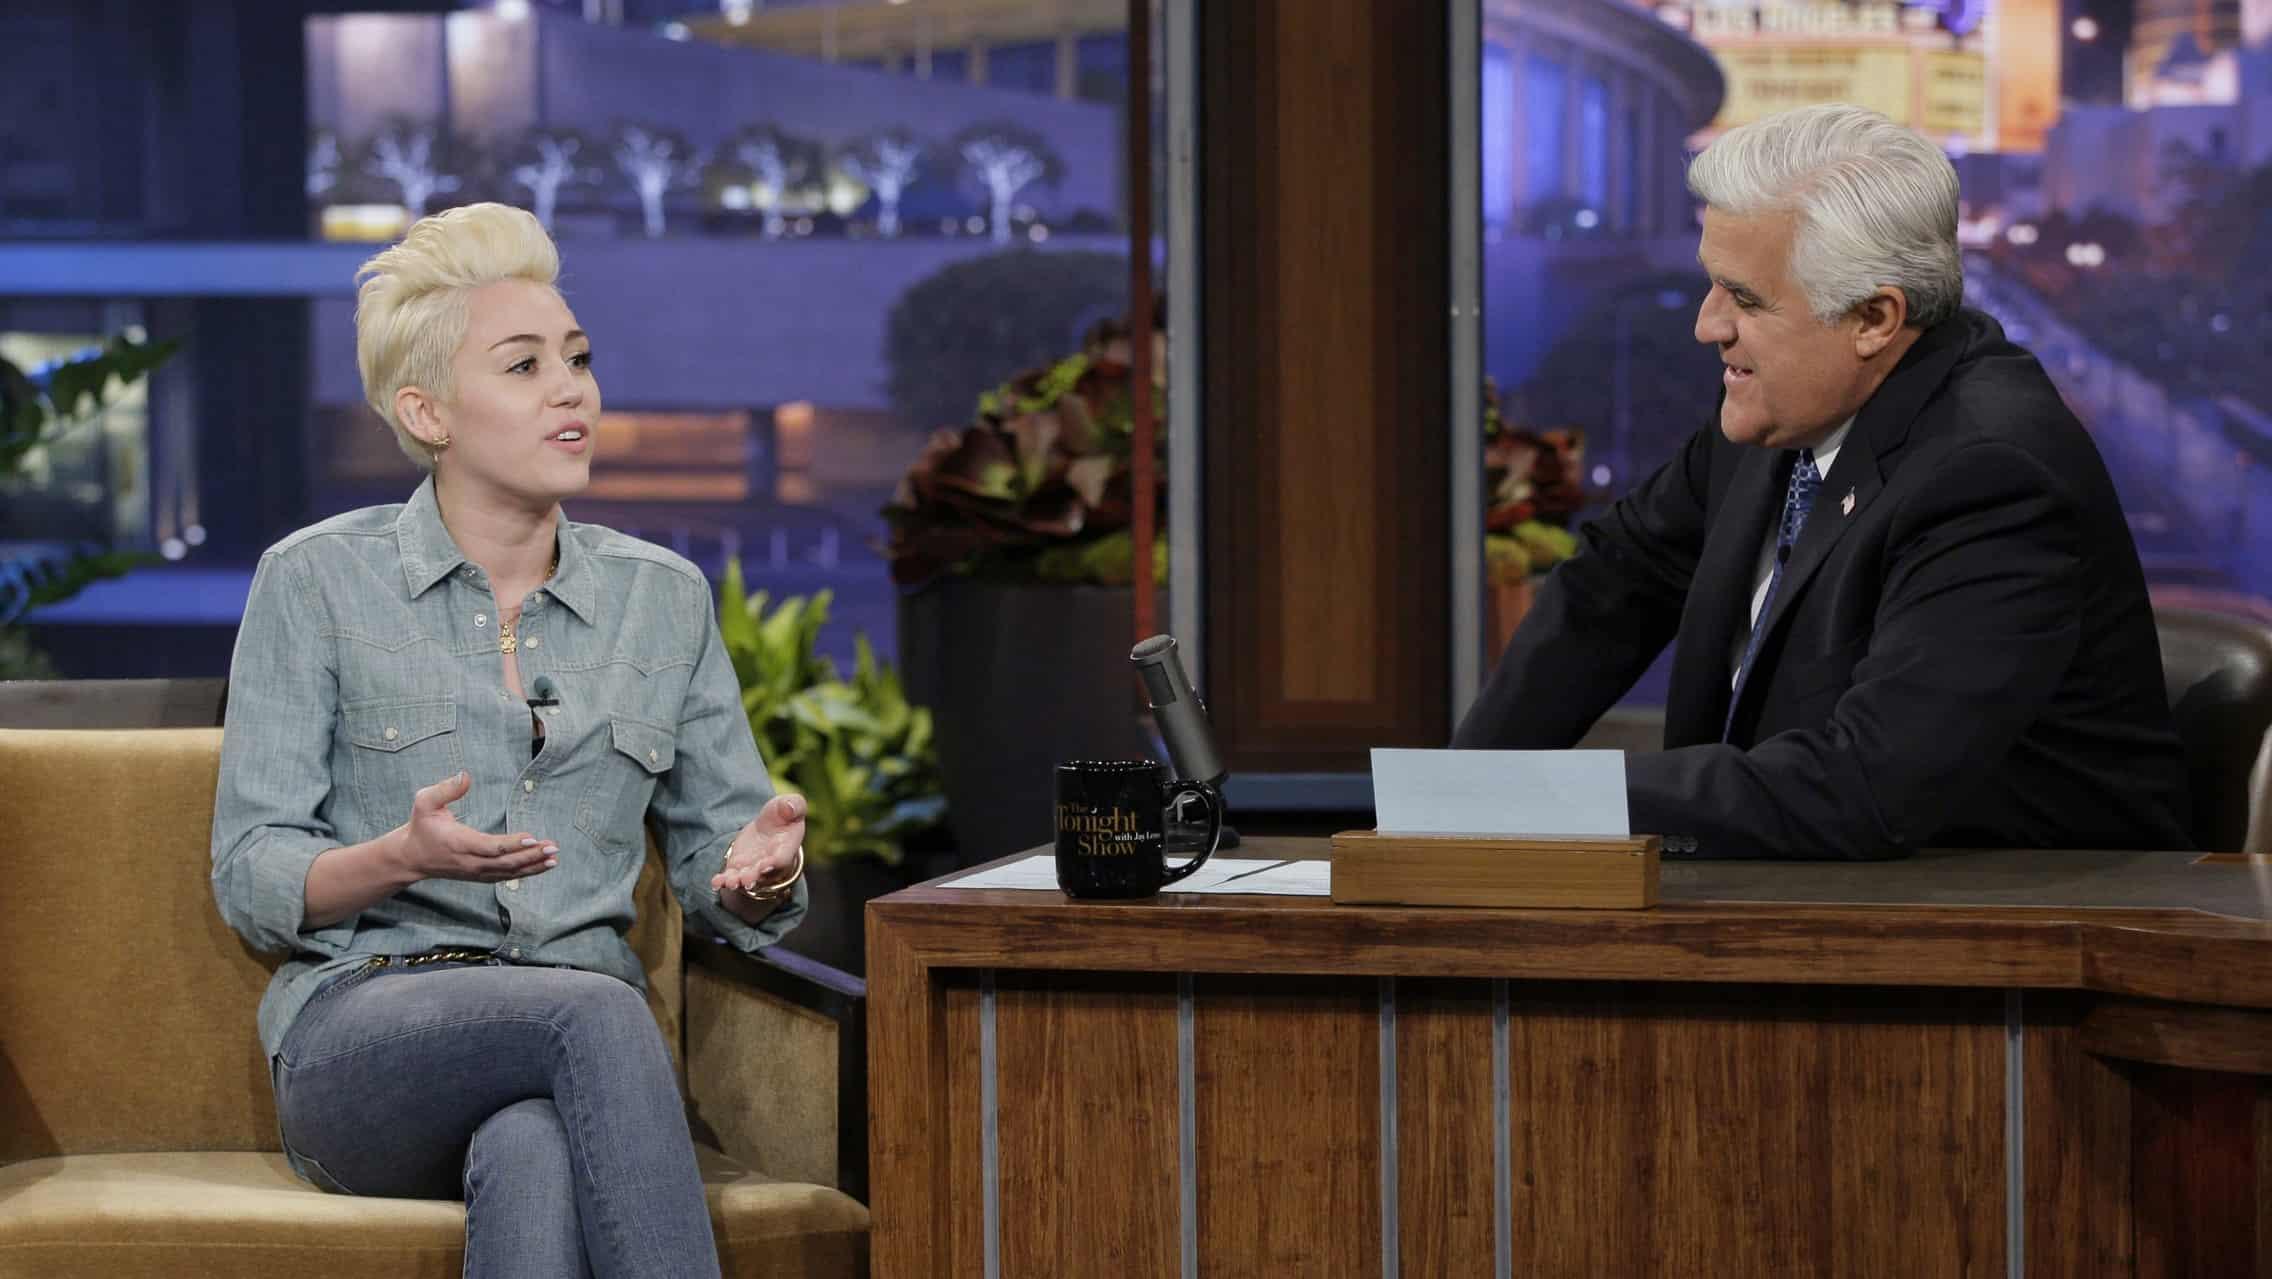 Miley Cyrus Jay Leno